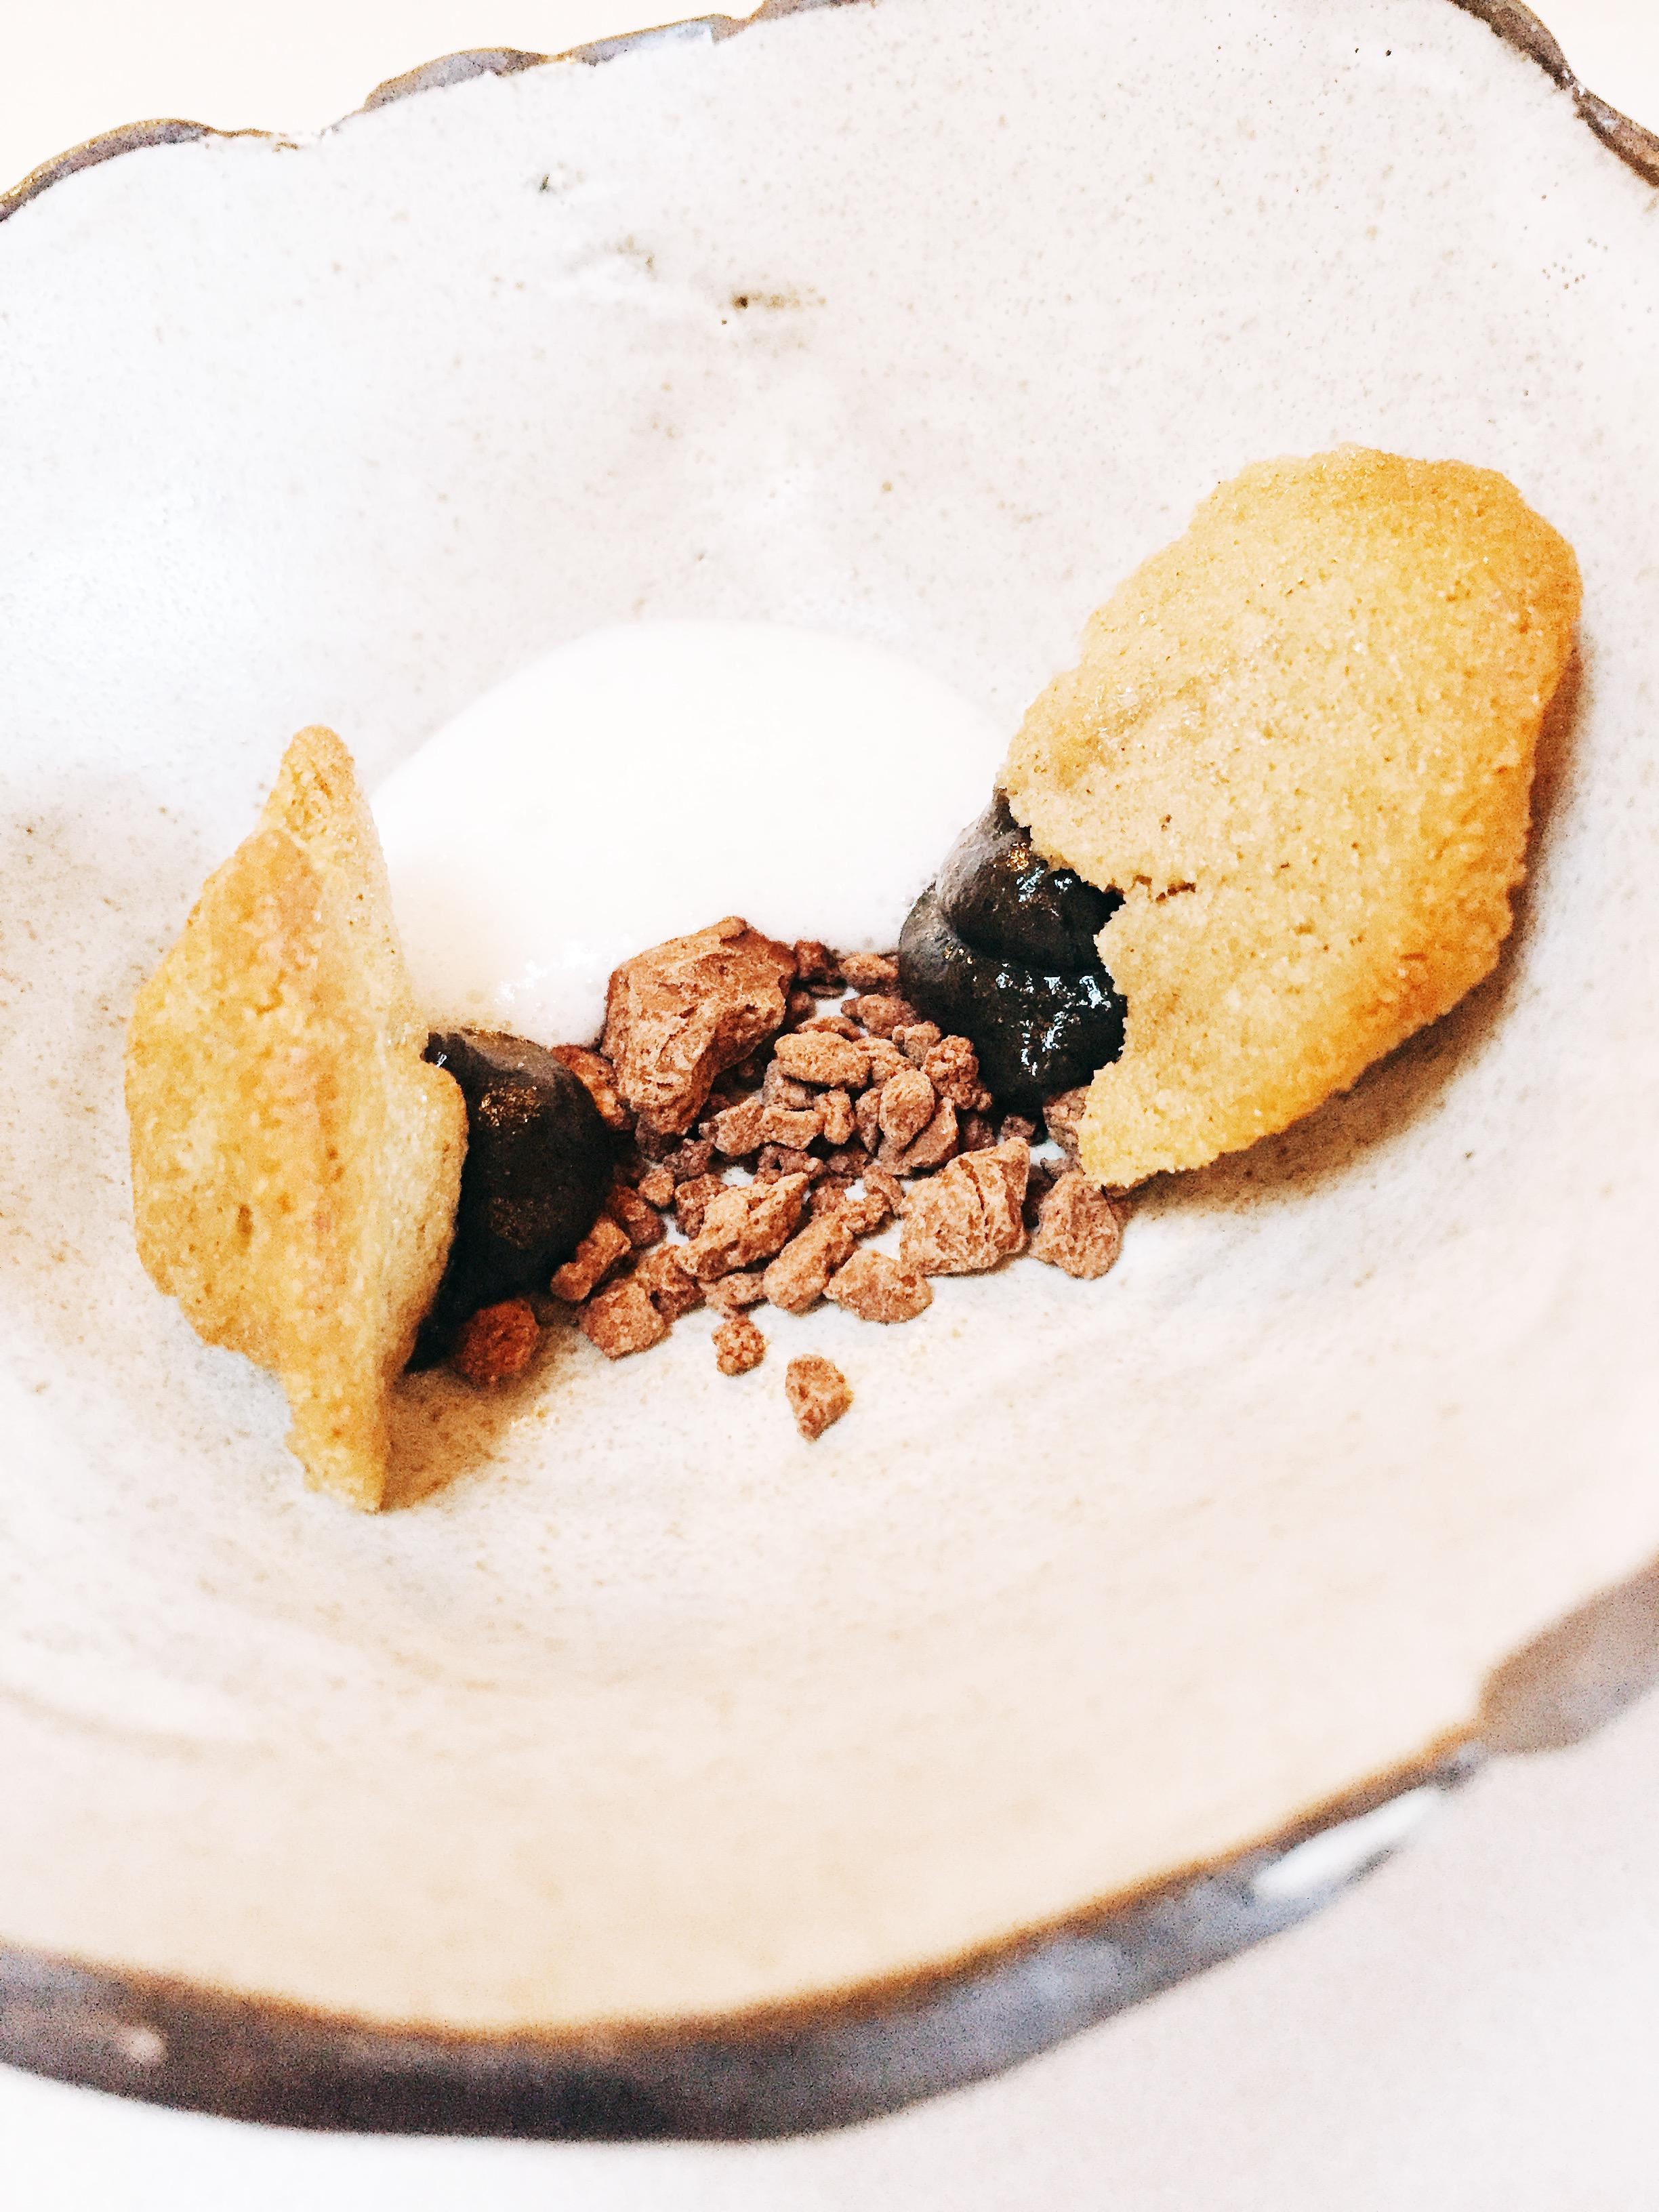 sunchoke and cardamom cake with cacao